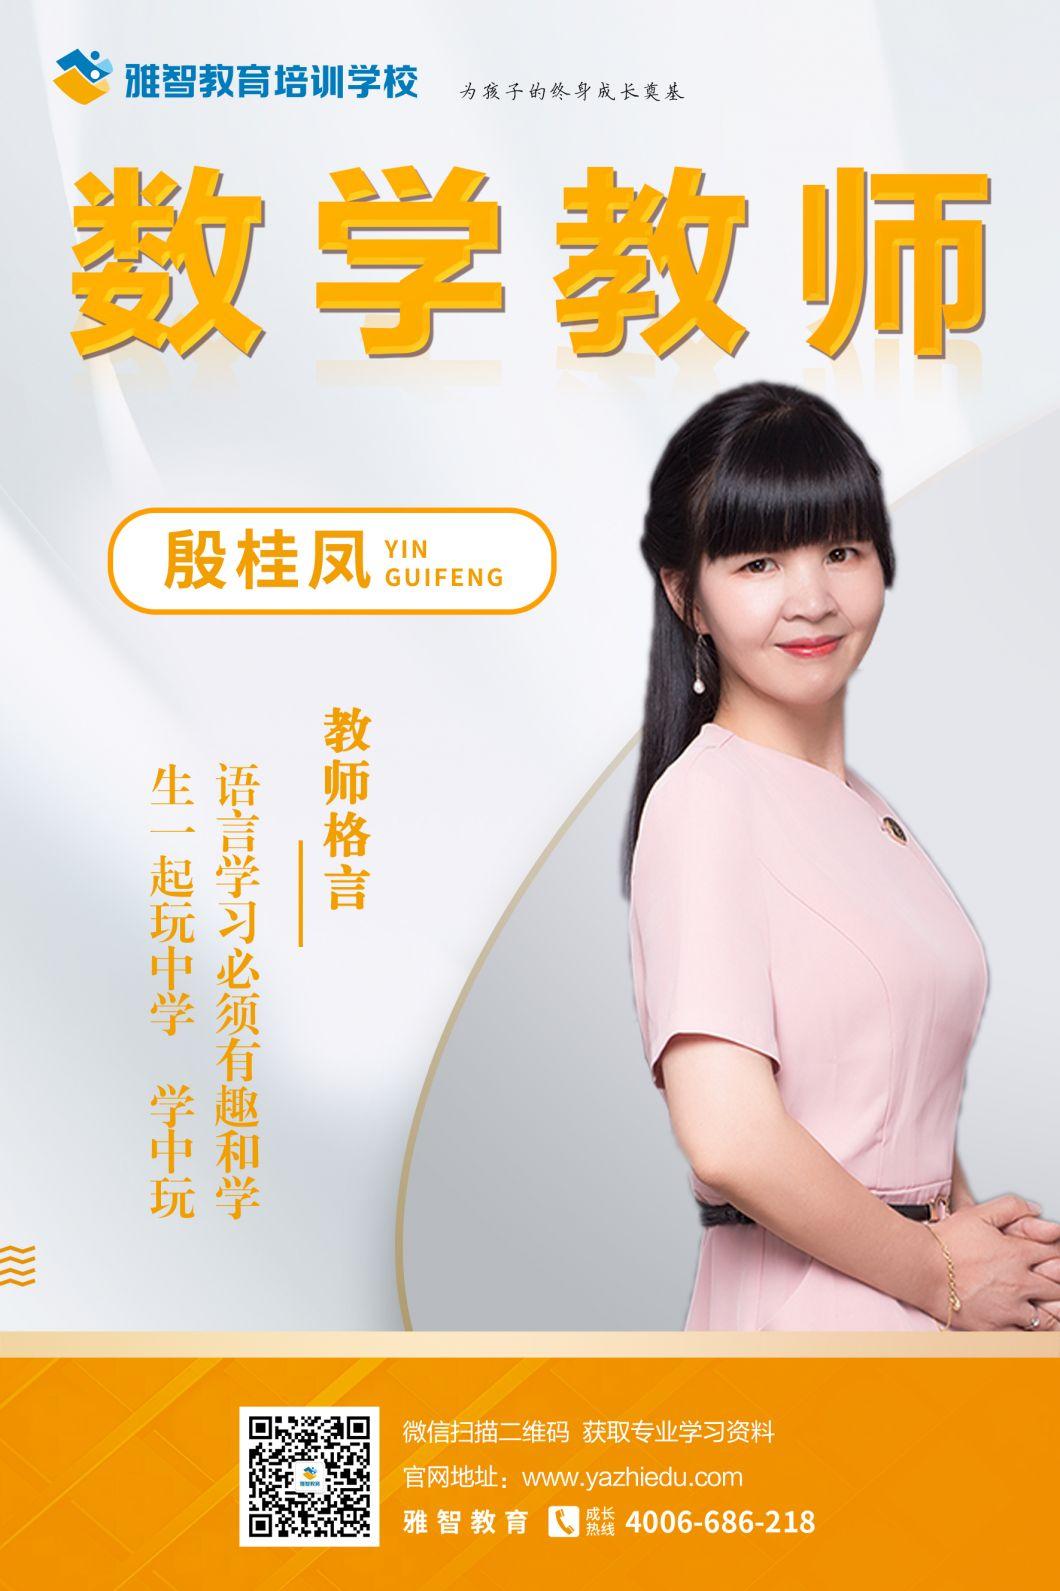 /uploads/image/2021/06/04/殷桂凤.jpg